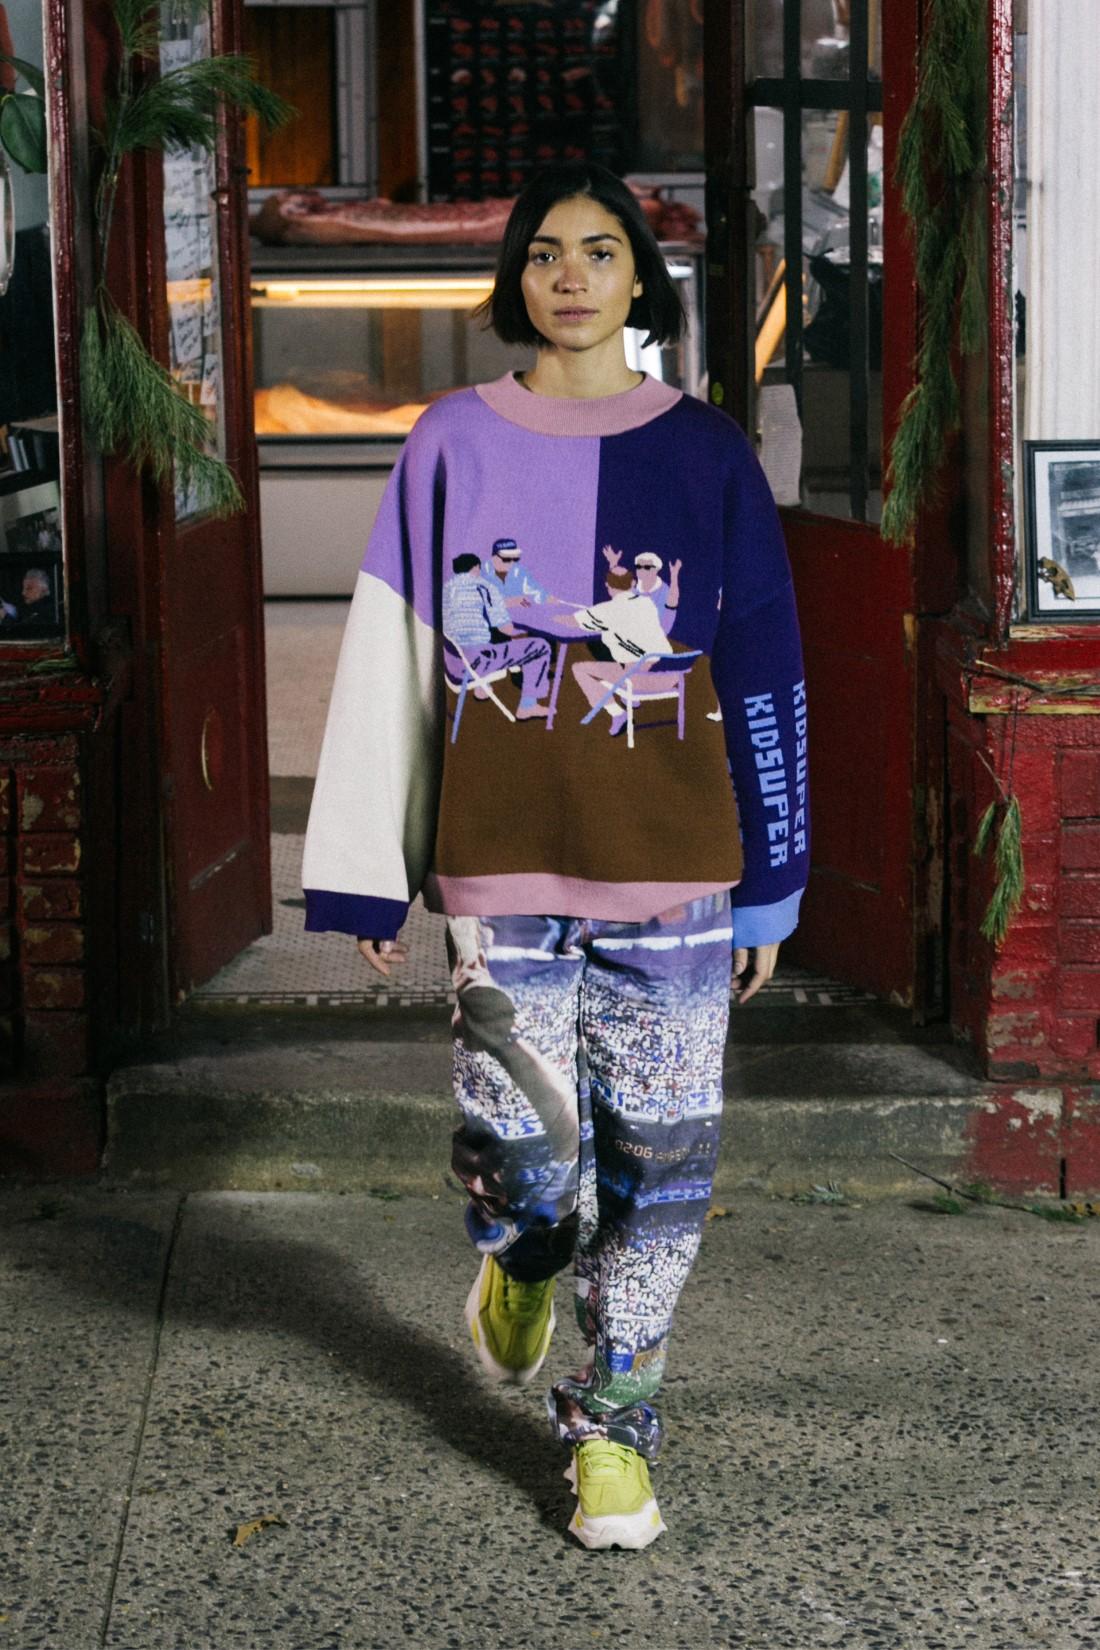 KidSuper - Automne-Hiver 2021 - Paris Fashion Week